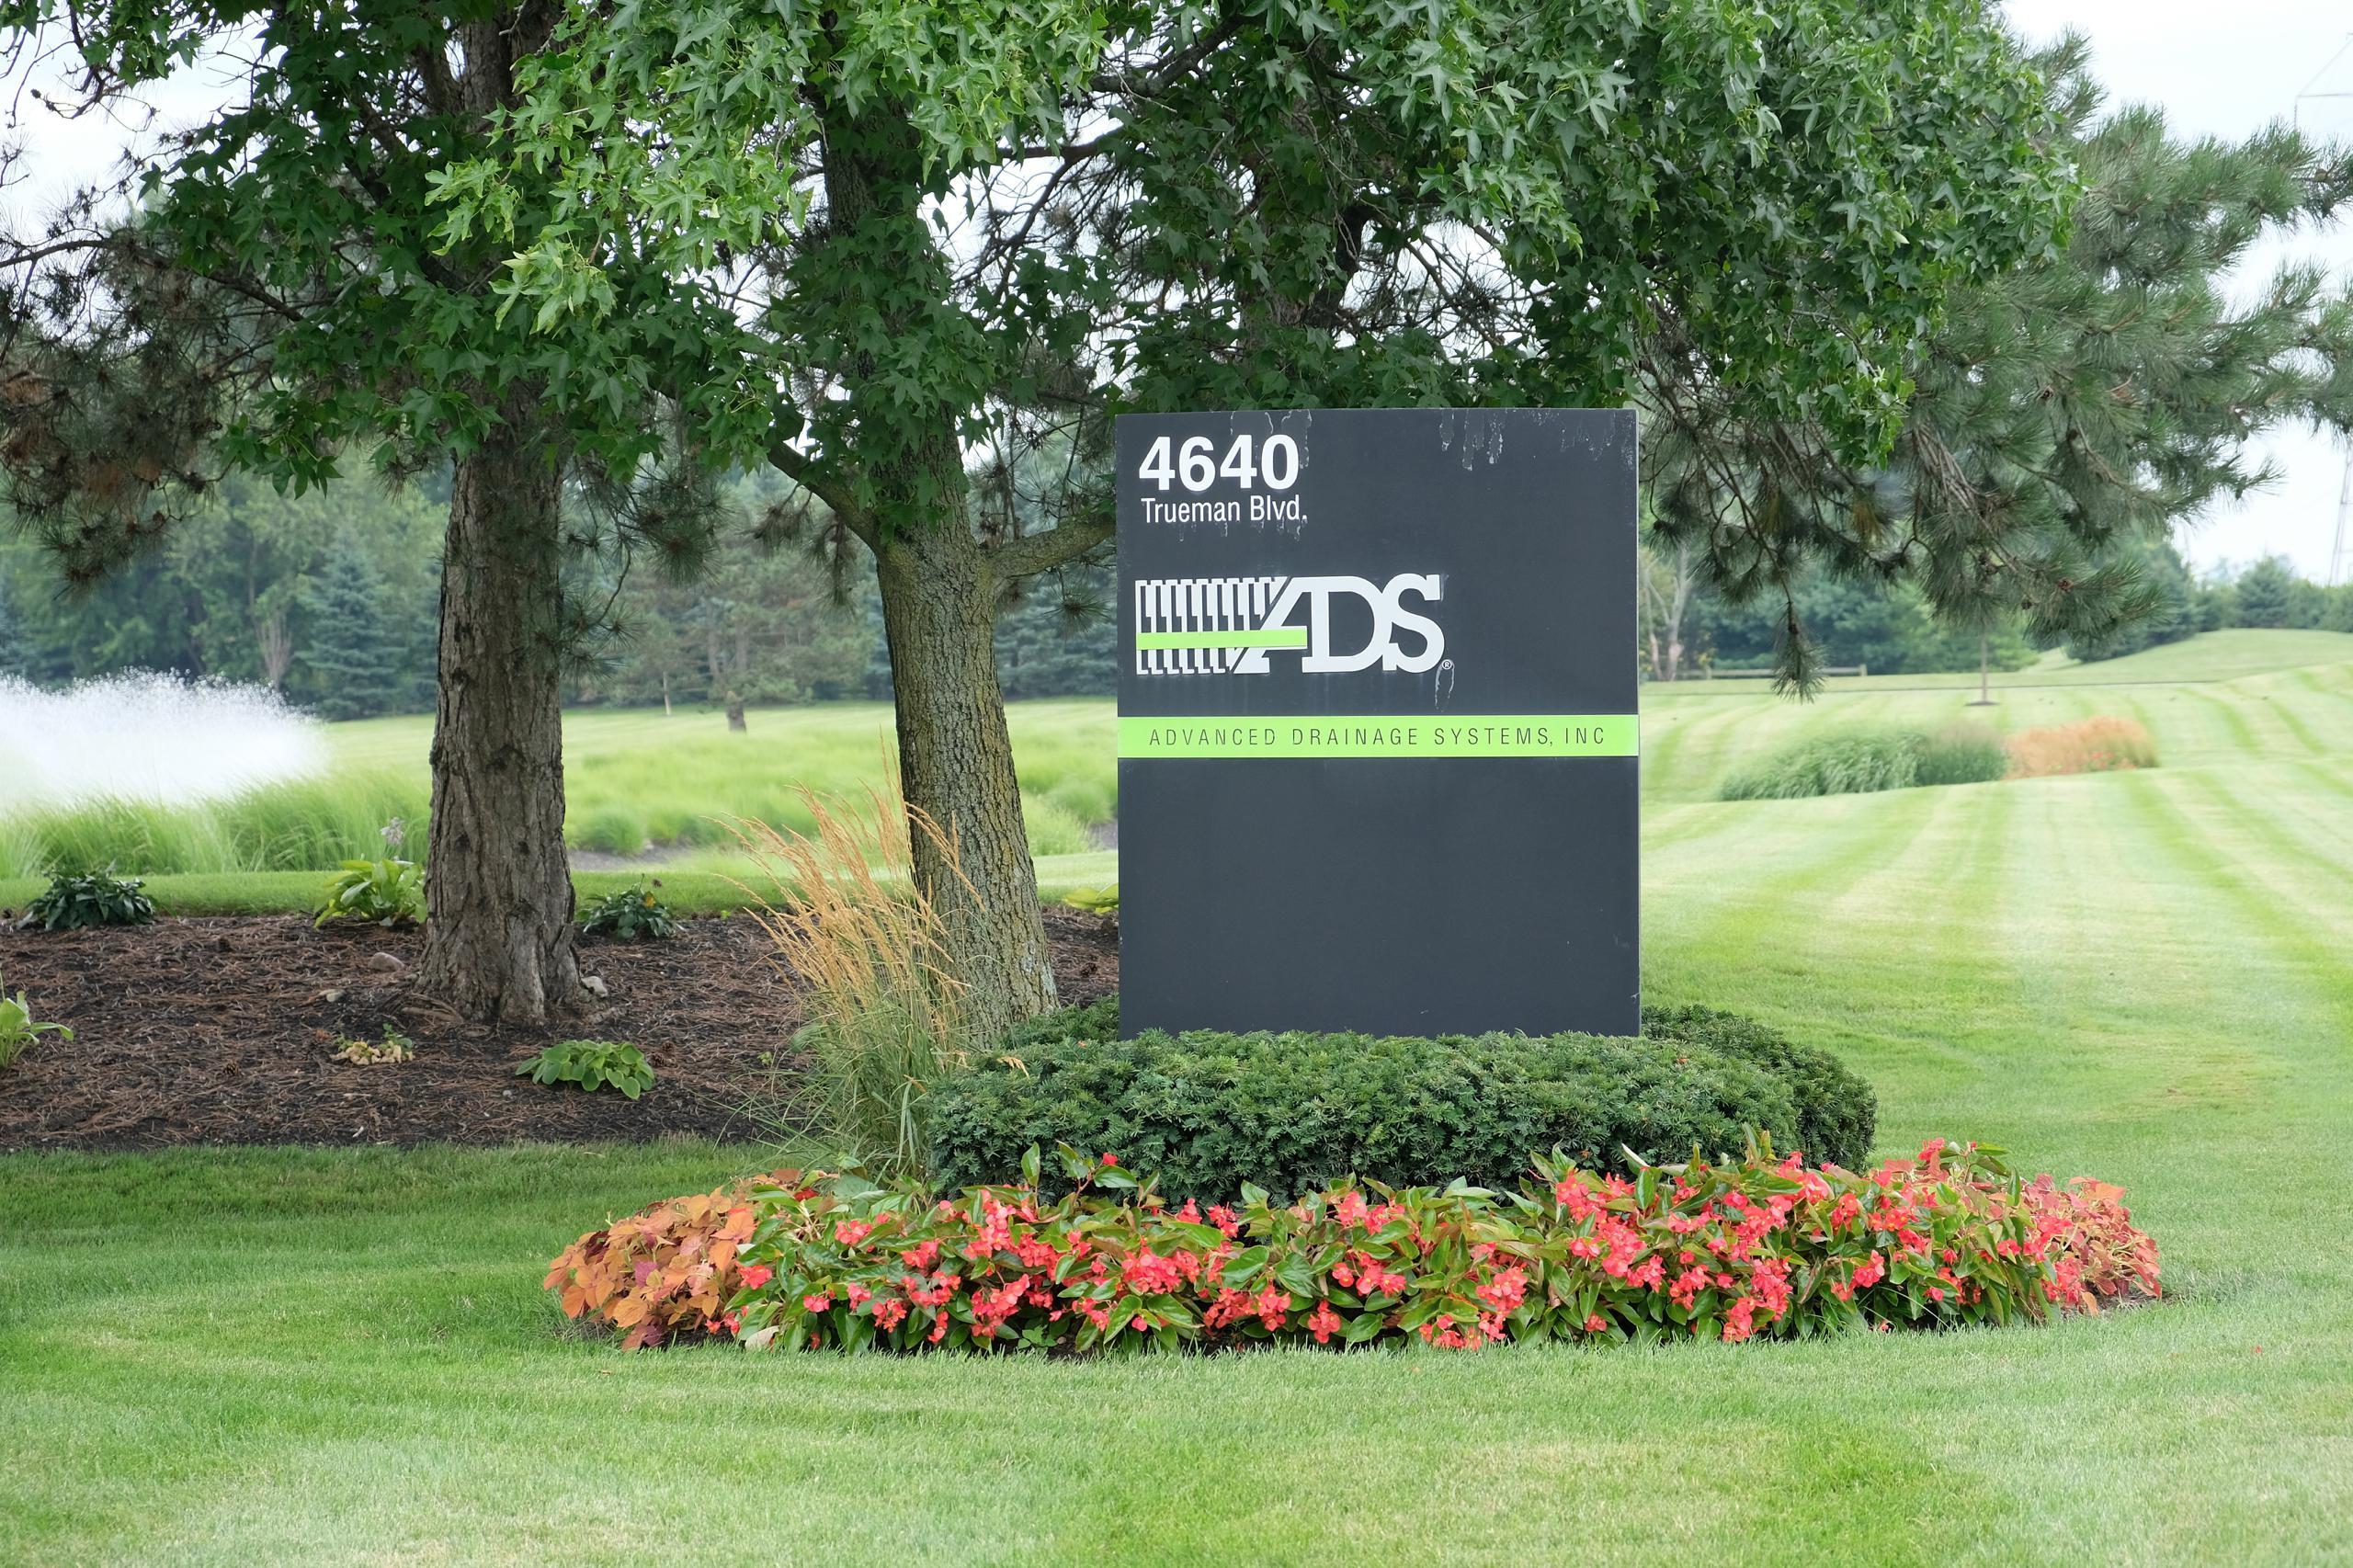 Advanced Drainage Systems, Inc.